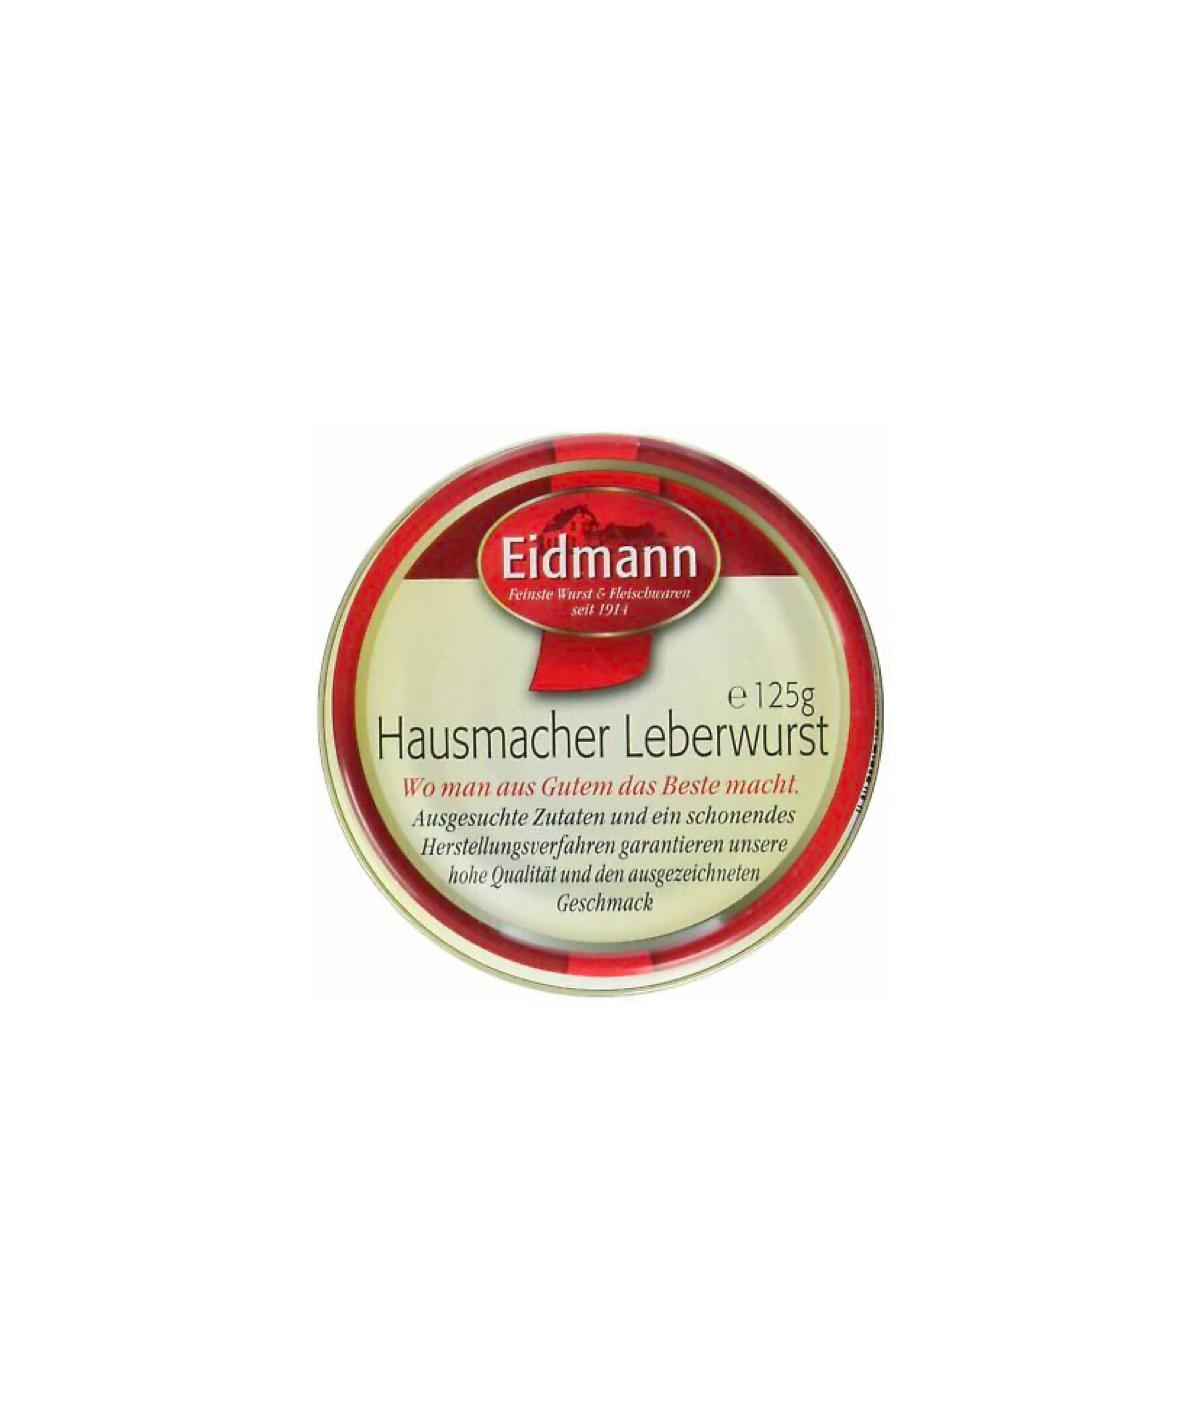 Hausmacher Leberwurst Eidmann  - 125g